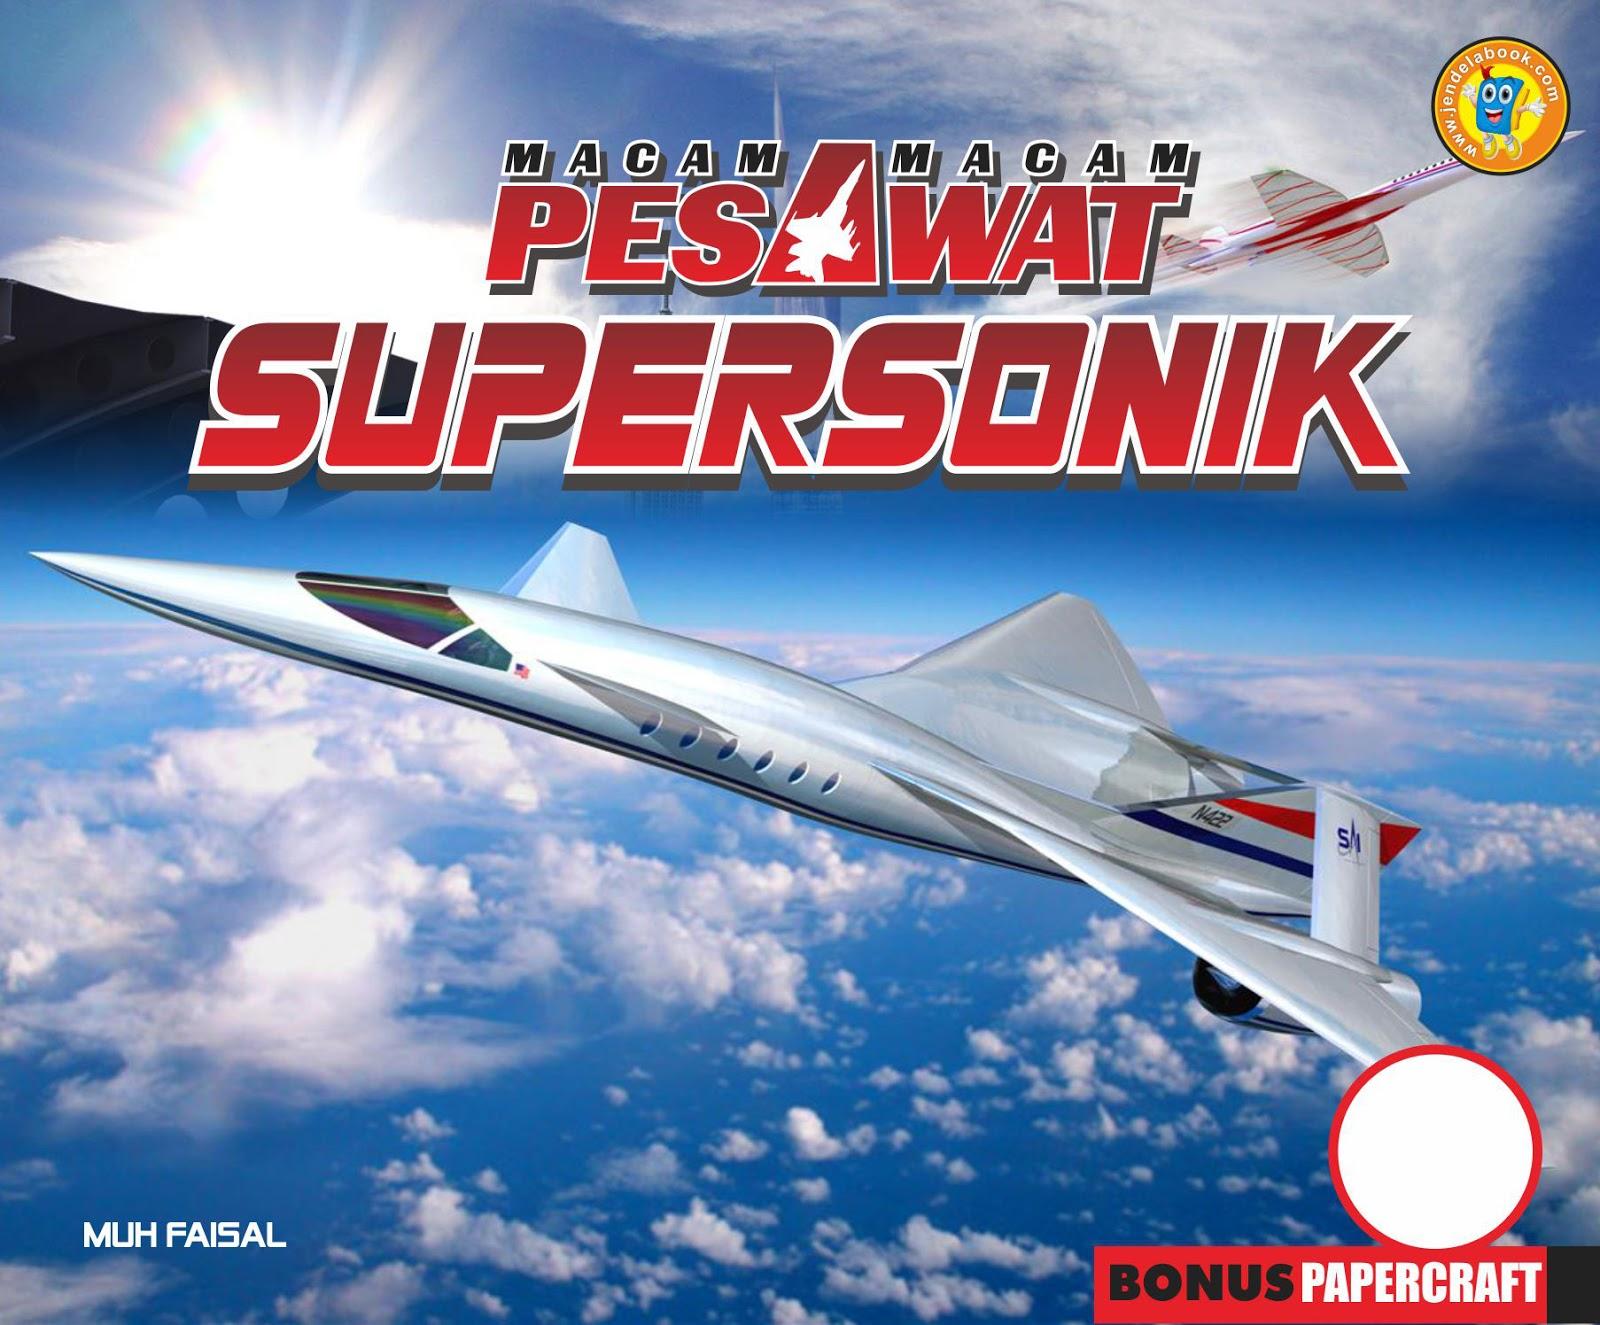 Fannani Lishan Macam Macam Pesawat Supersonik